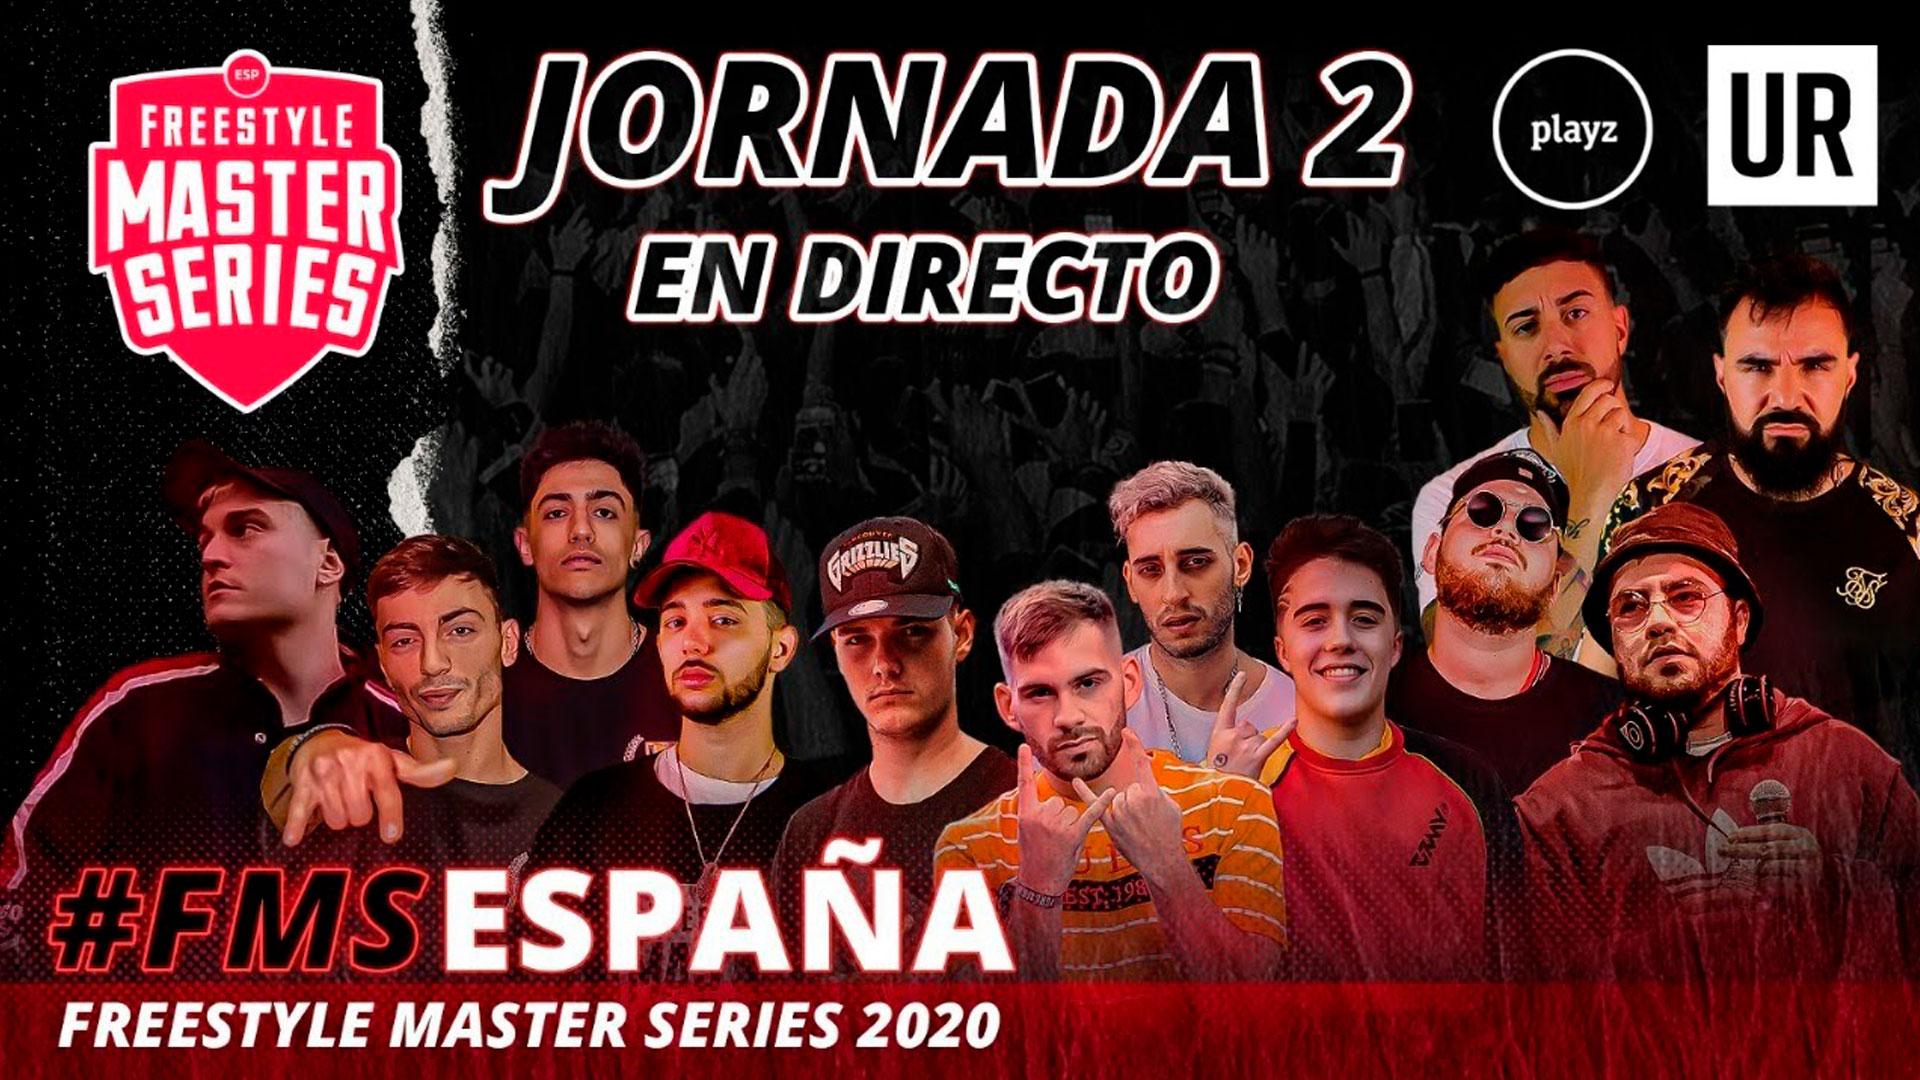 #FMS 2020 – Jornada 2